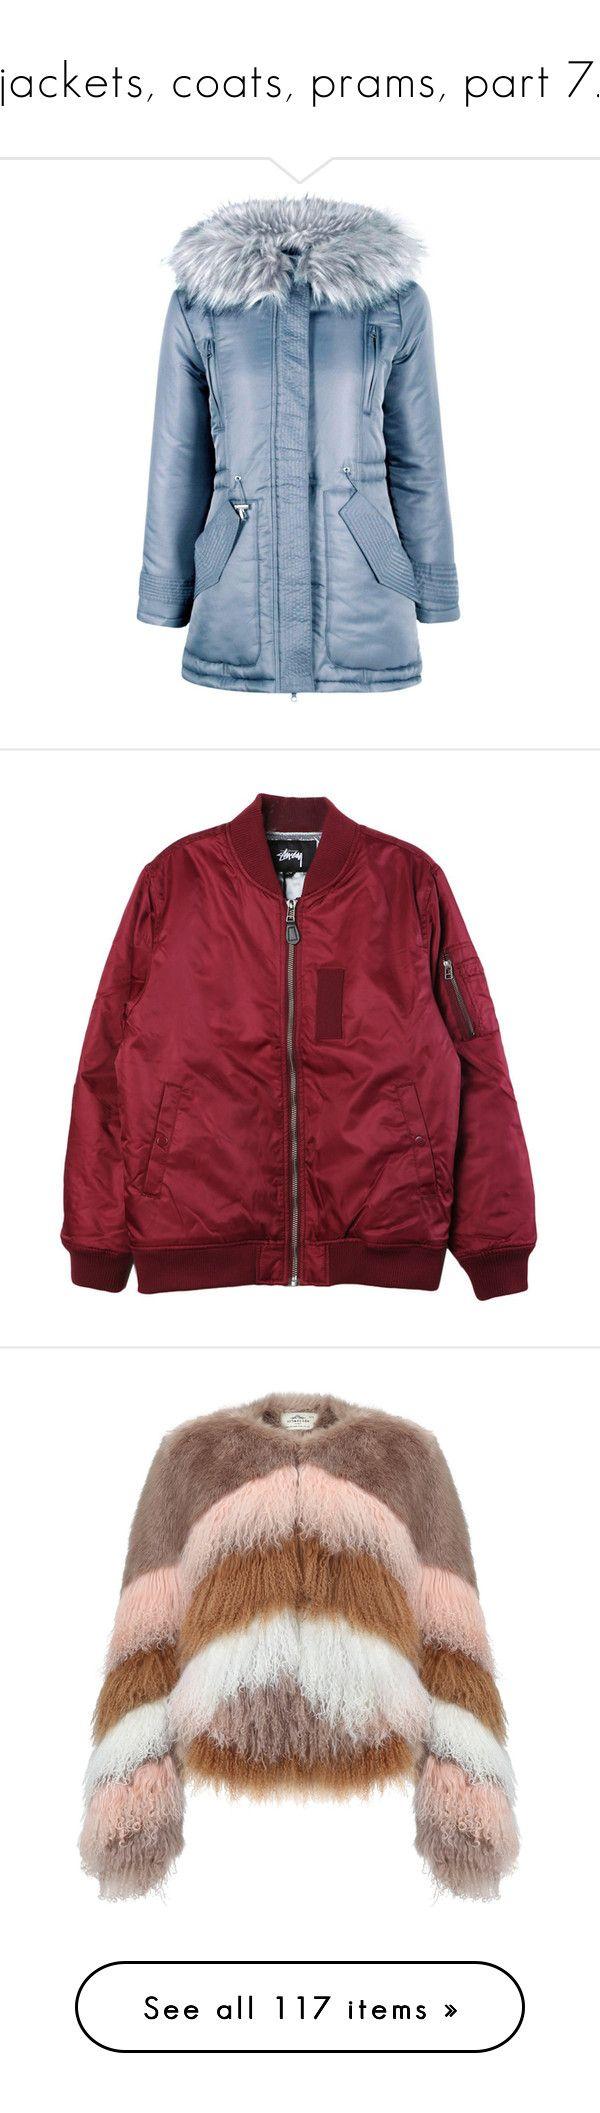 """jackets, coats, prams, part 7."" by trillestqueen ❤ liked on Polyvore featuring outerwear, coats, blue parka coat, faux fur hood coat, petite parka coats, petite coats, blue coat, jackets, tops and clothing - outerwear"